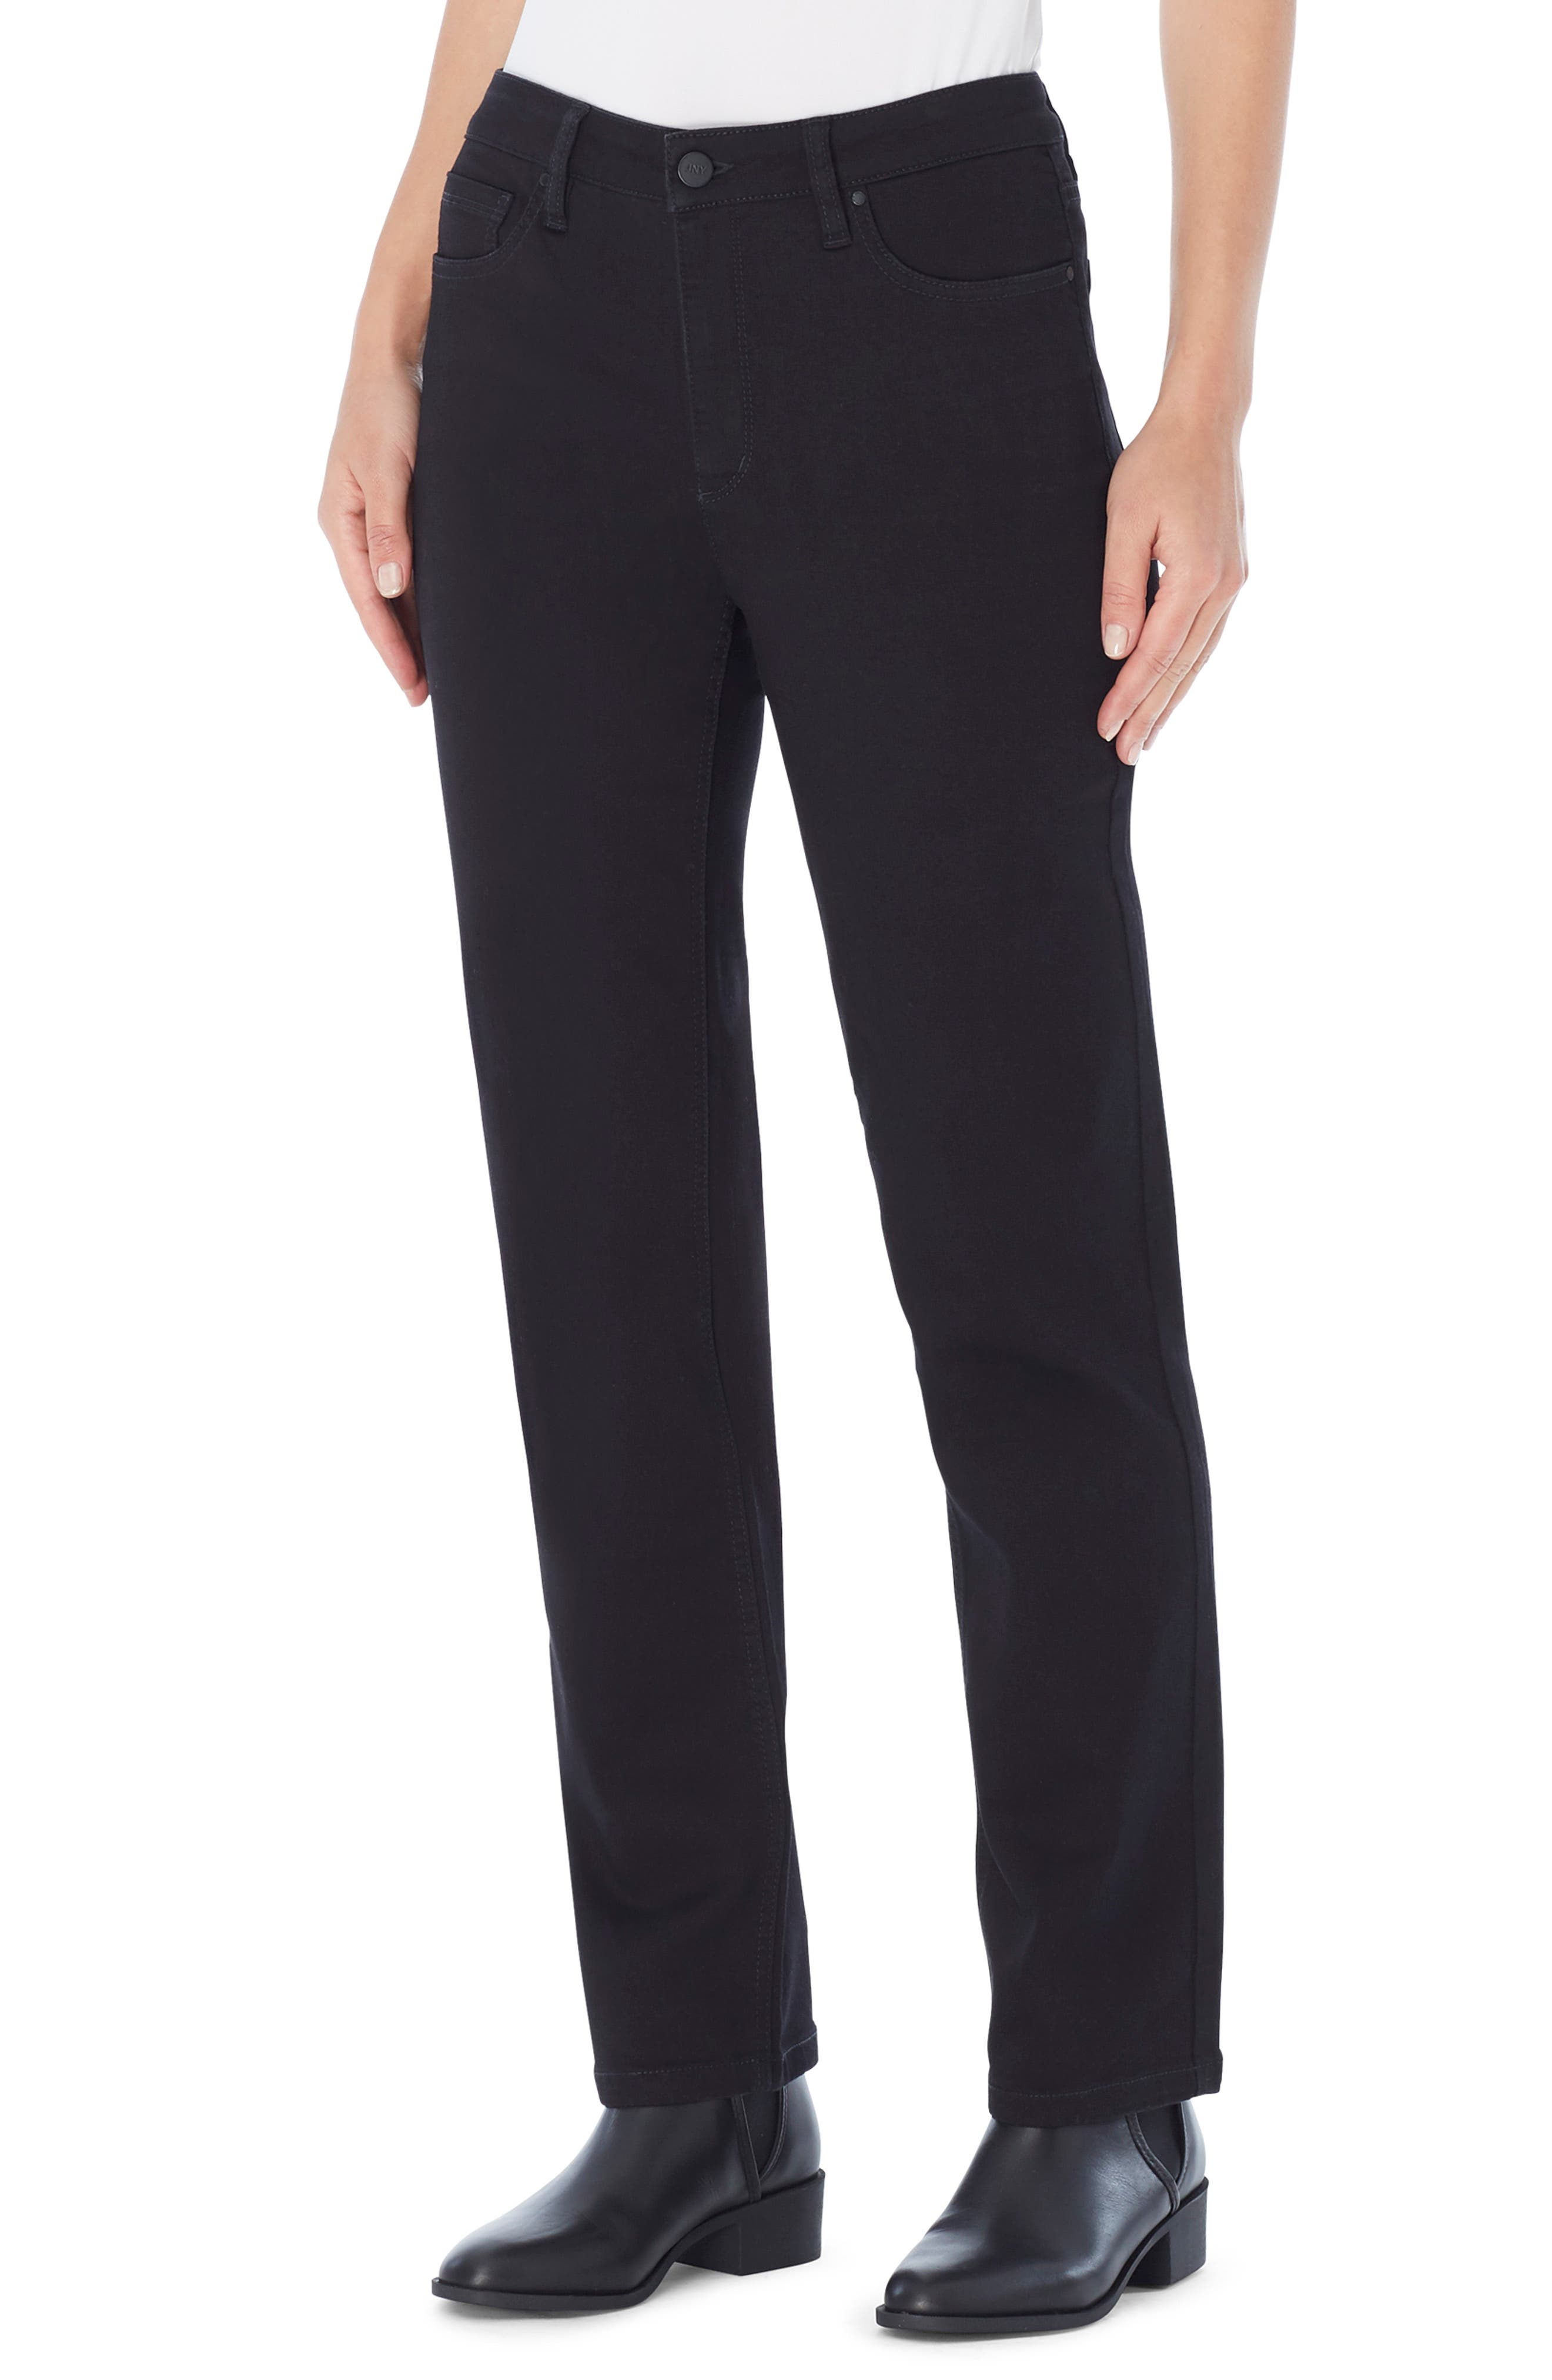 Women's Jones New York Lexington Bootcut Jeans